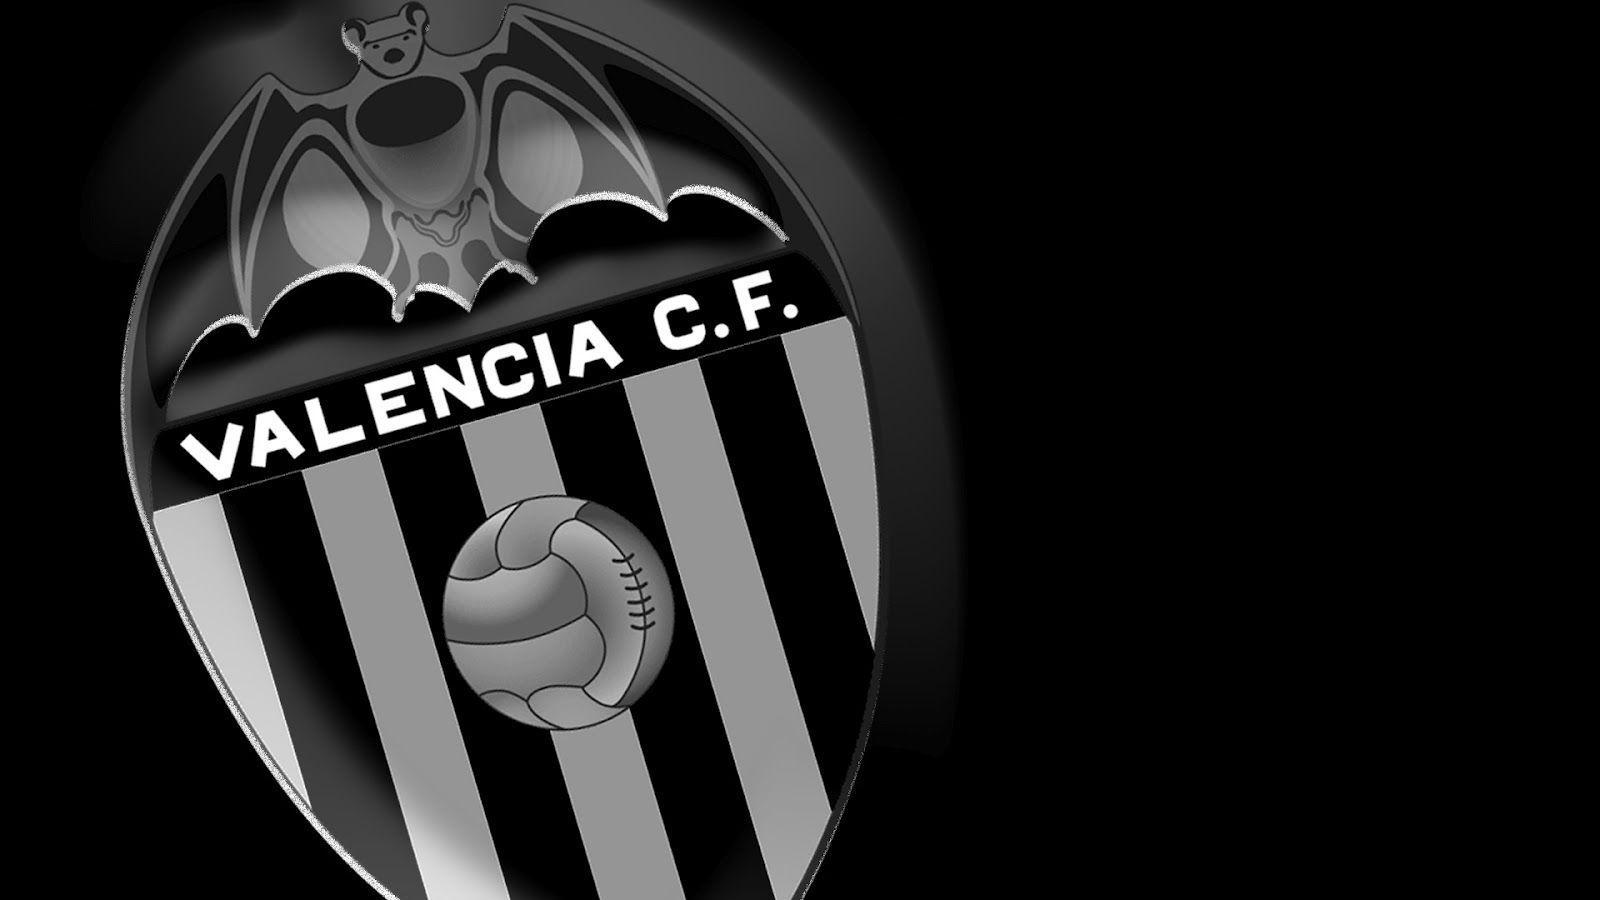 1600x900 Valencia CF: Valencia CF Wallpapers